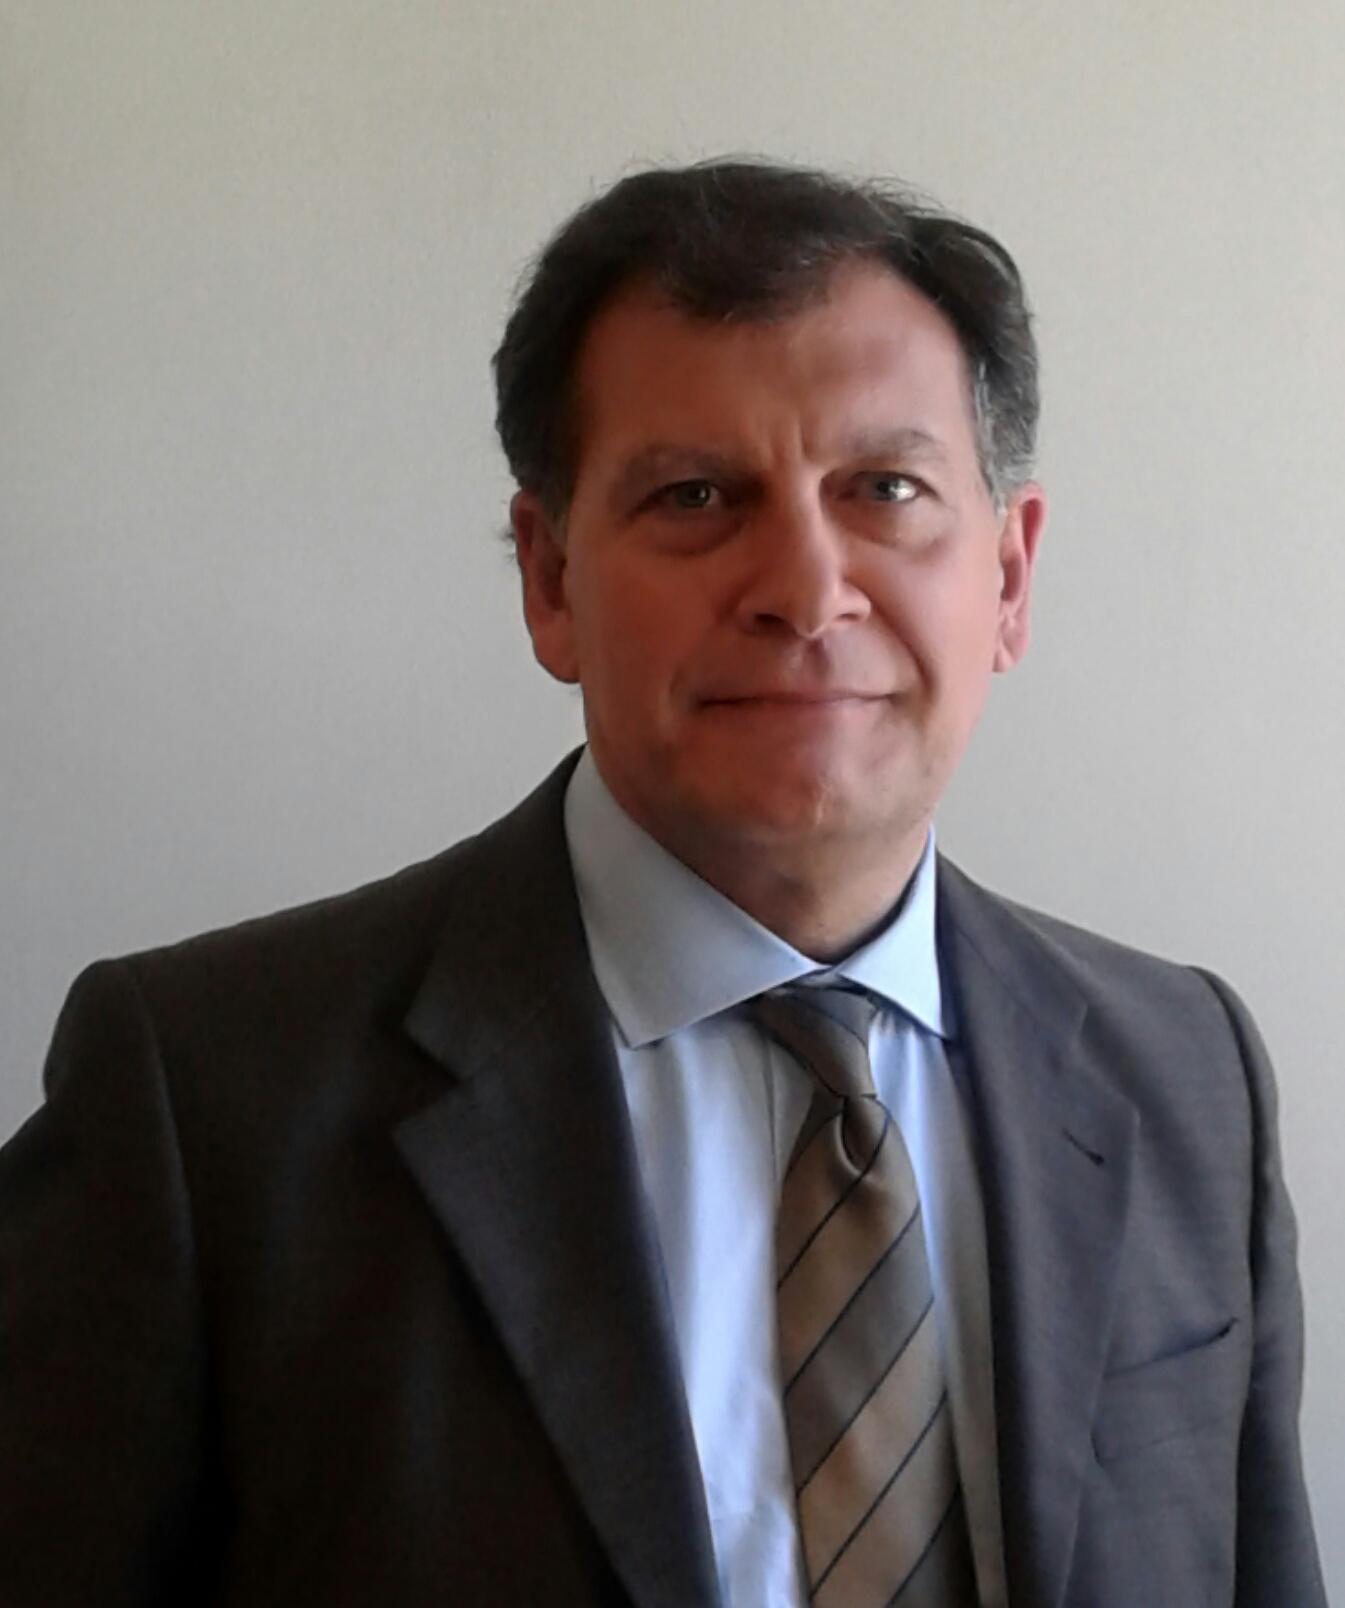 Giancarlo Tagliolini